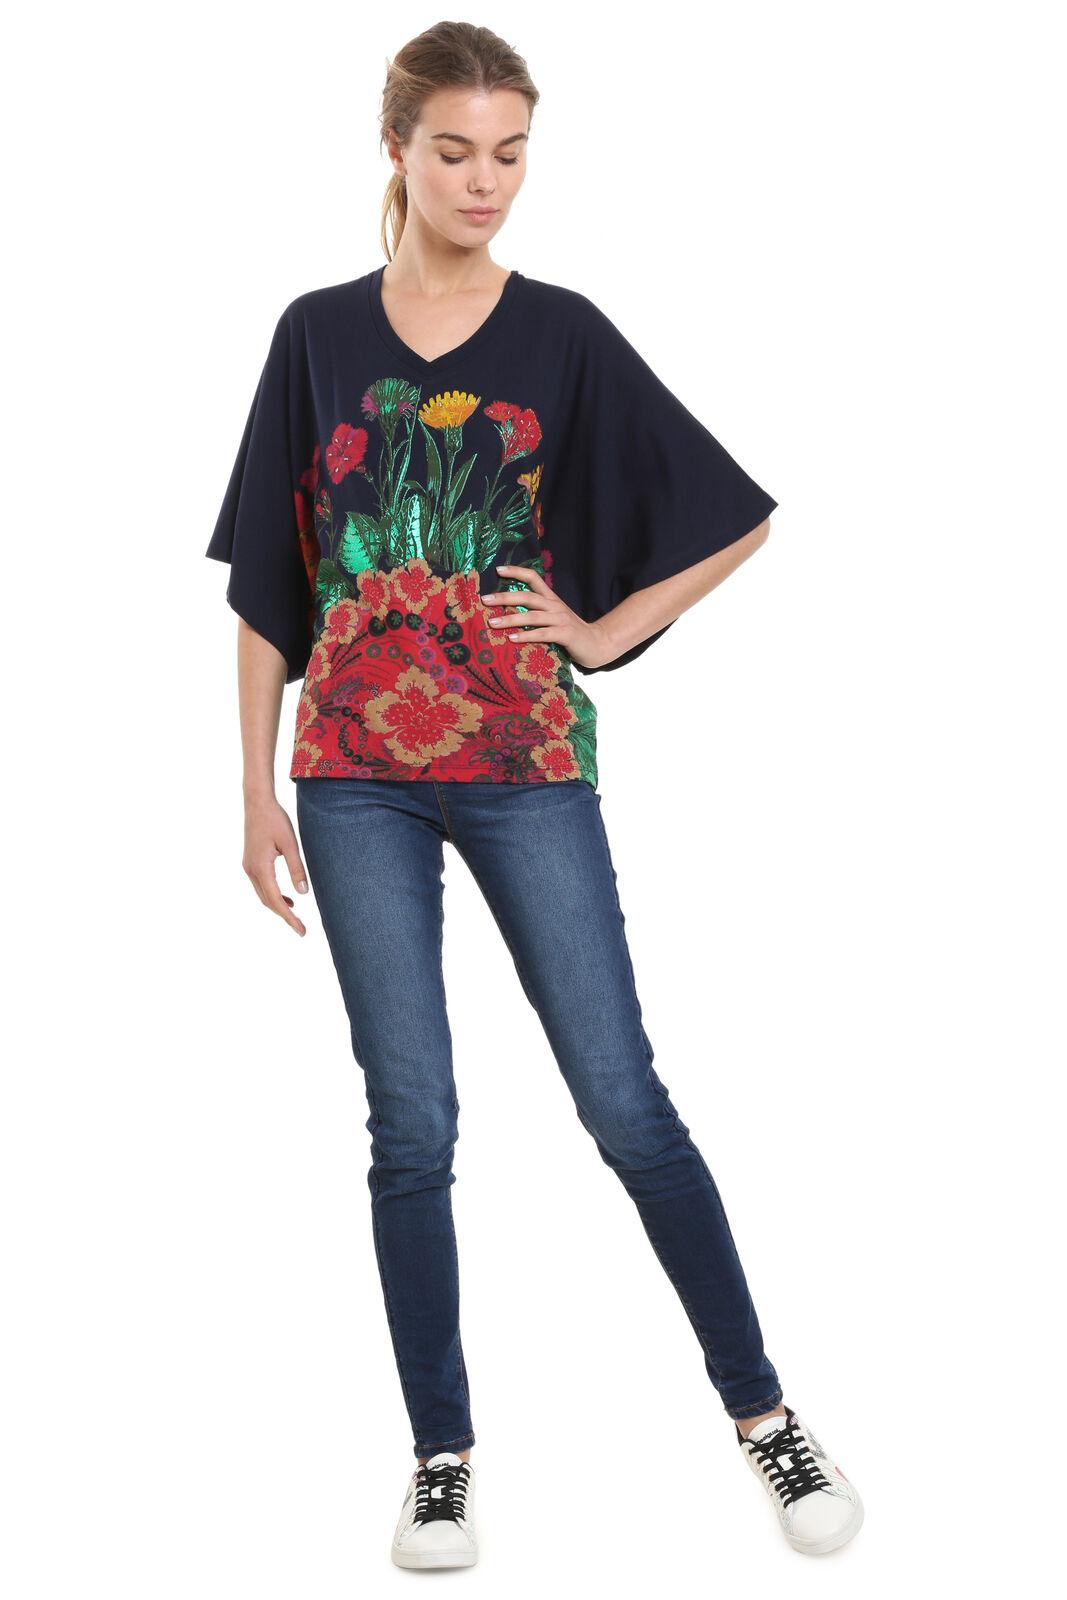 Desigual Freeman Blau  Floral Batwing Tshirt Top XS-XXL RRP